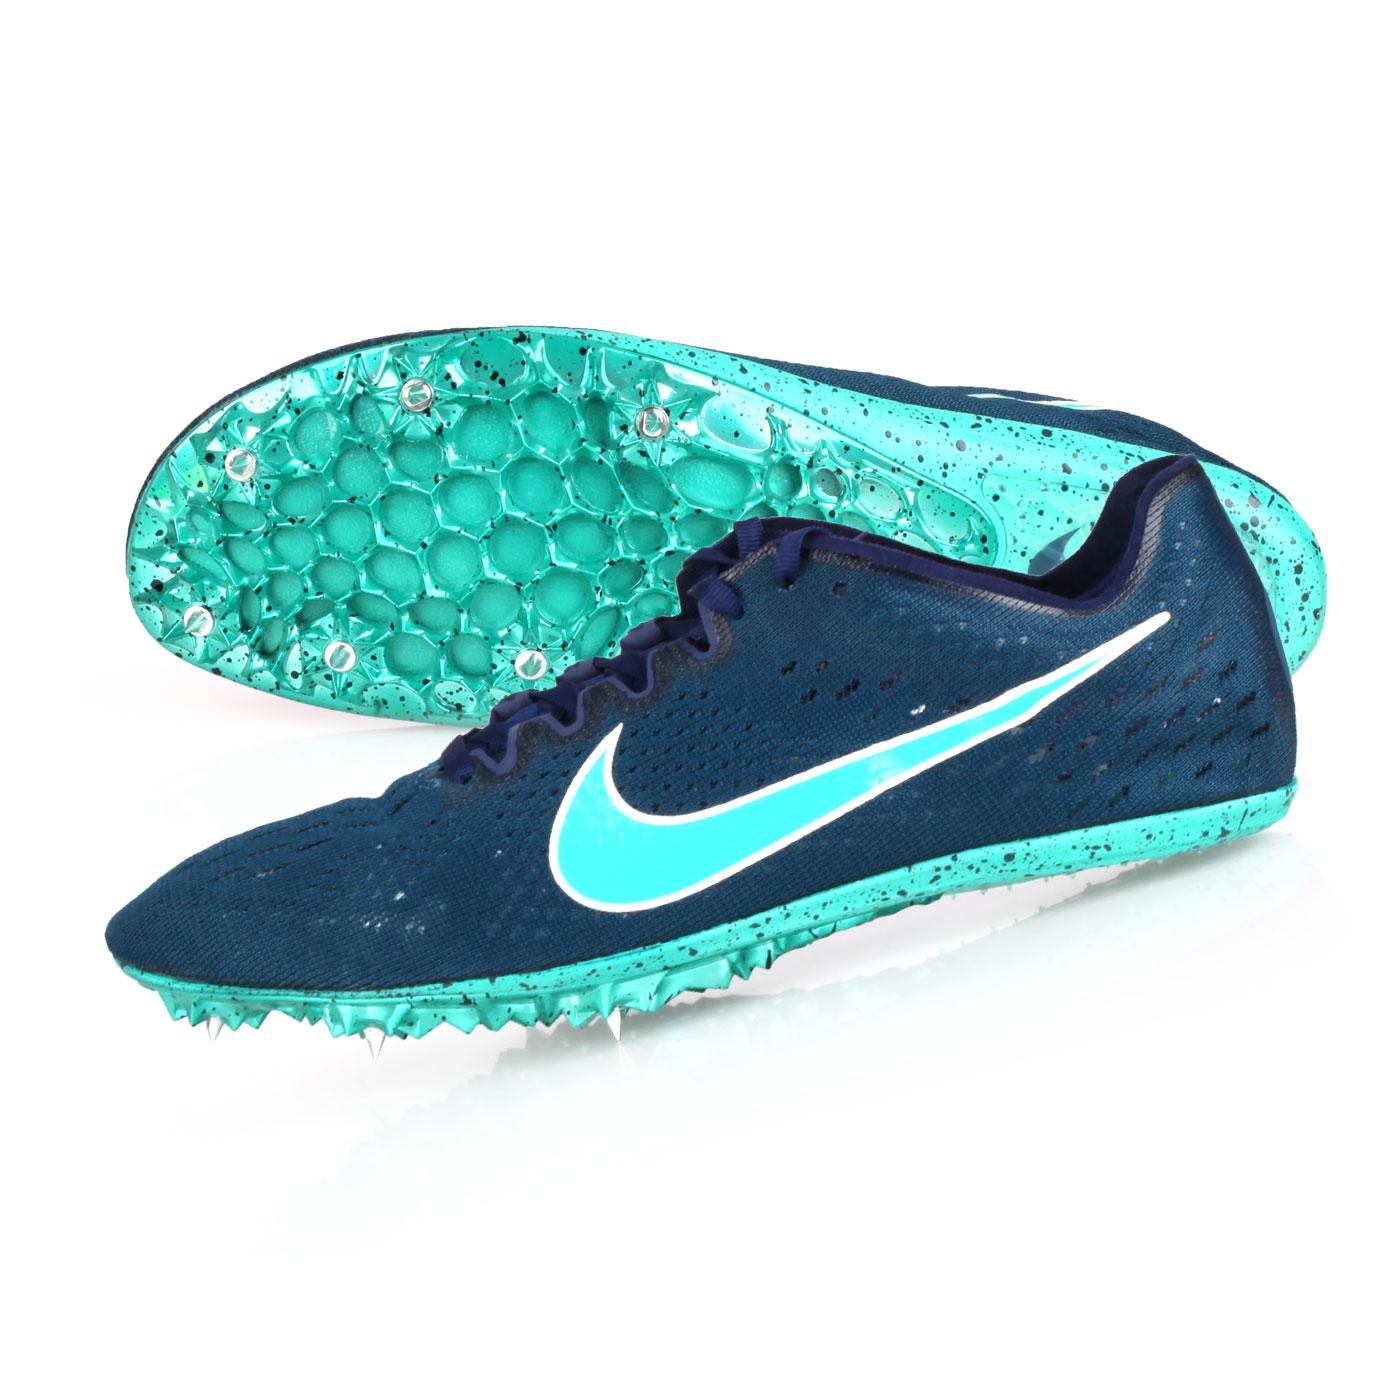 NIKE 田徑釘鞋(中長距離)  @ZOOM VICTORY ELITE 2@835998001 - 墨藍湖水綠